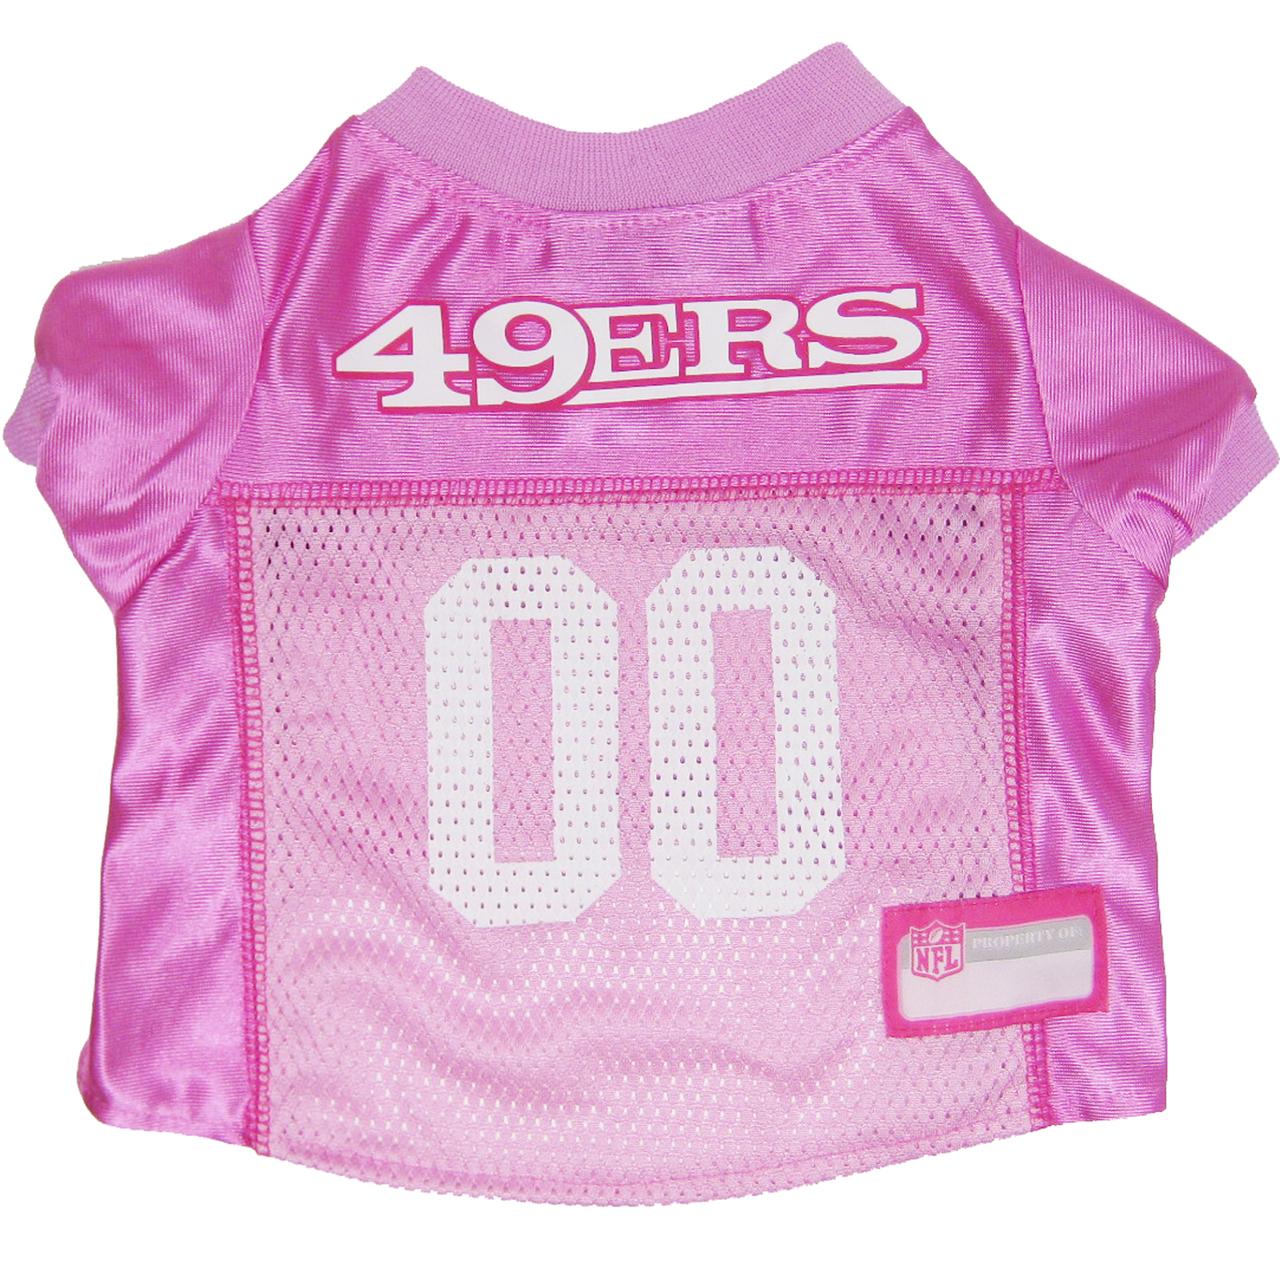 Hot Dog SF 49ers PINK NFL Football Pet/ Dog Jersey